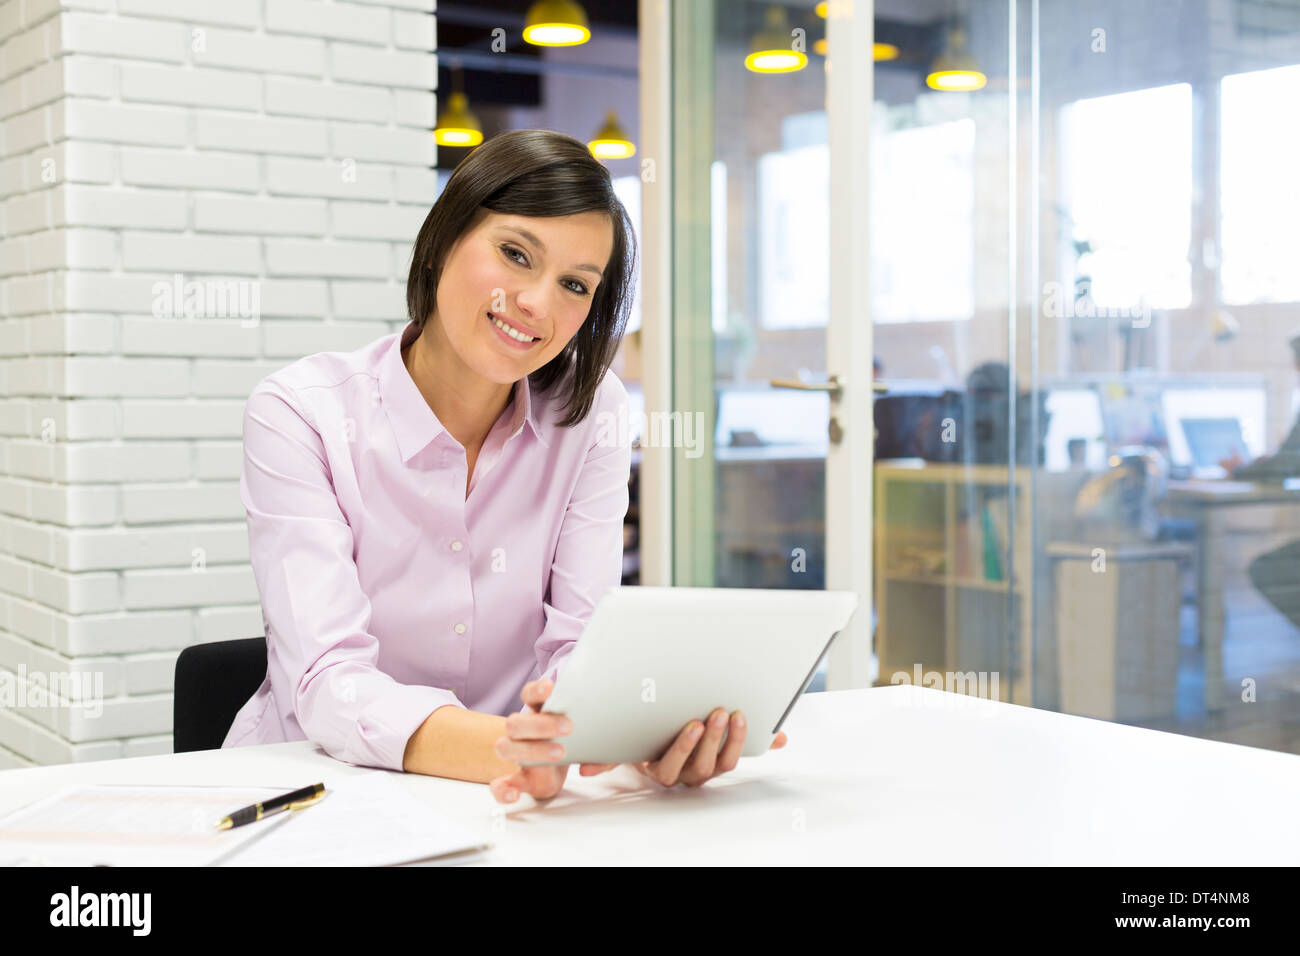 Female pc tablet desk e-mail - Stock Image